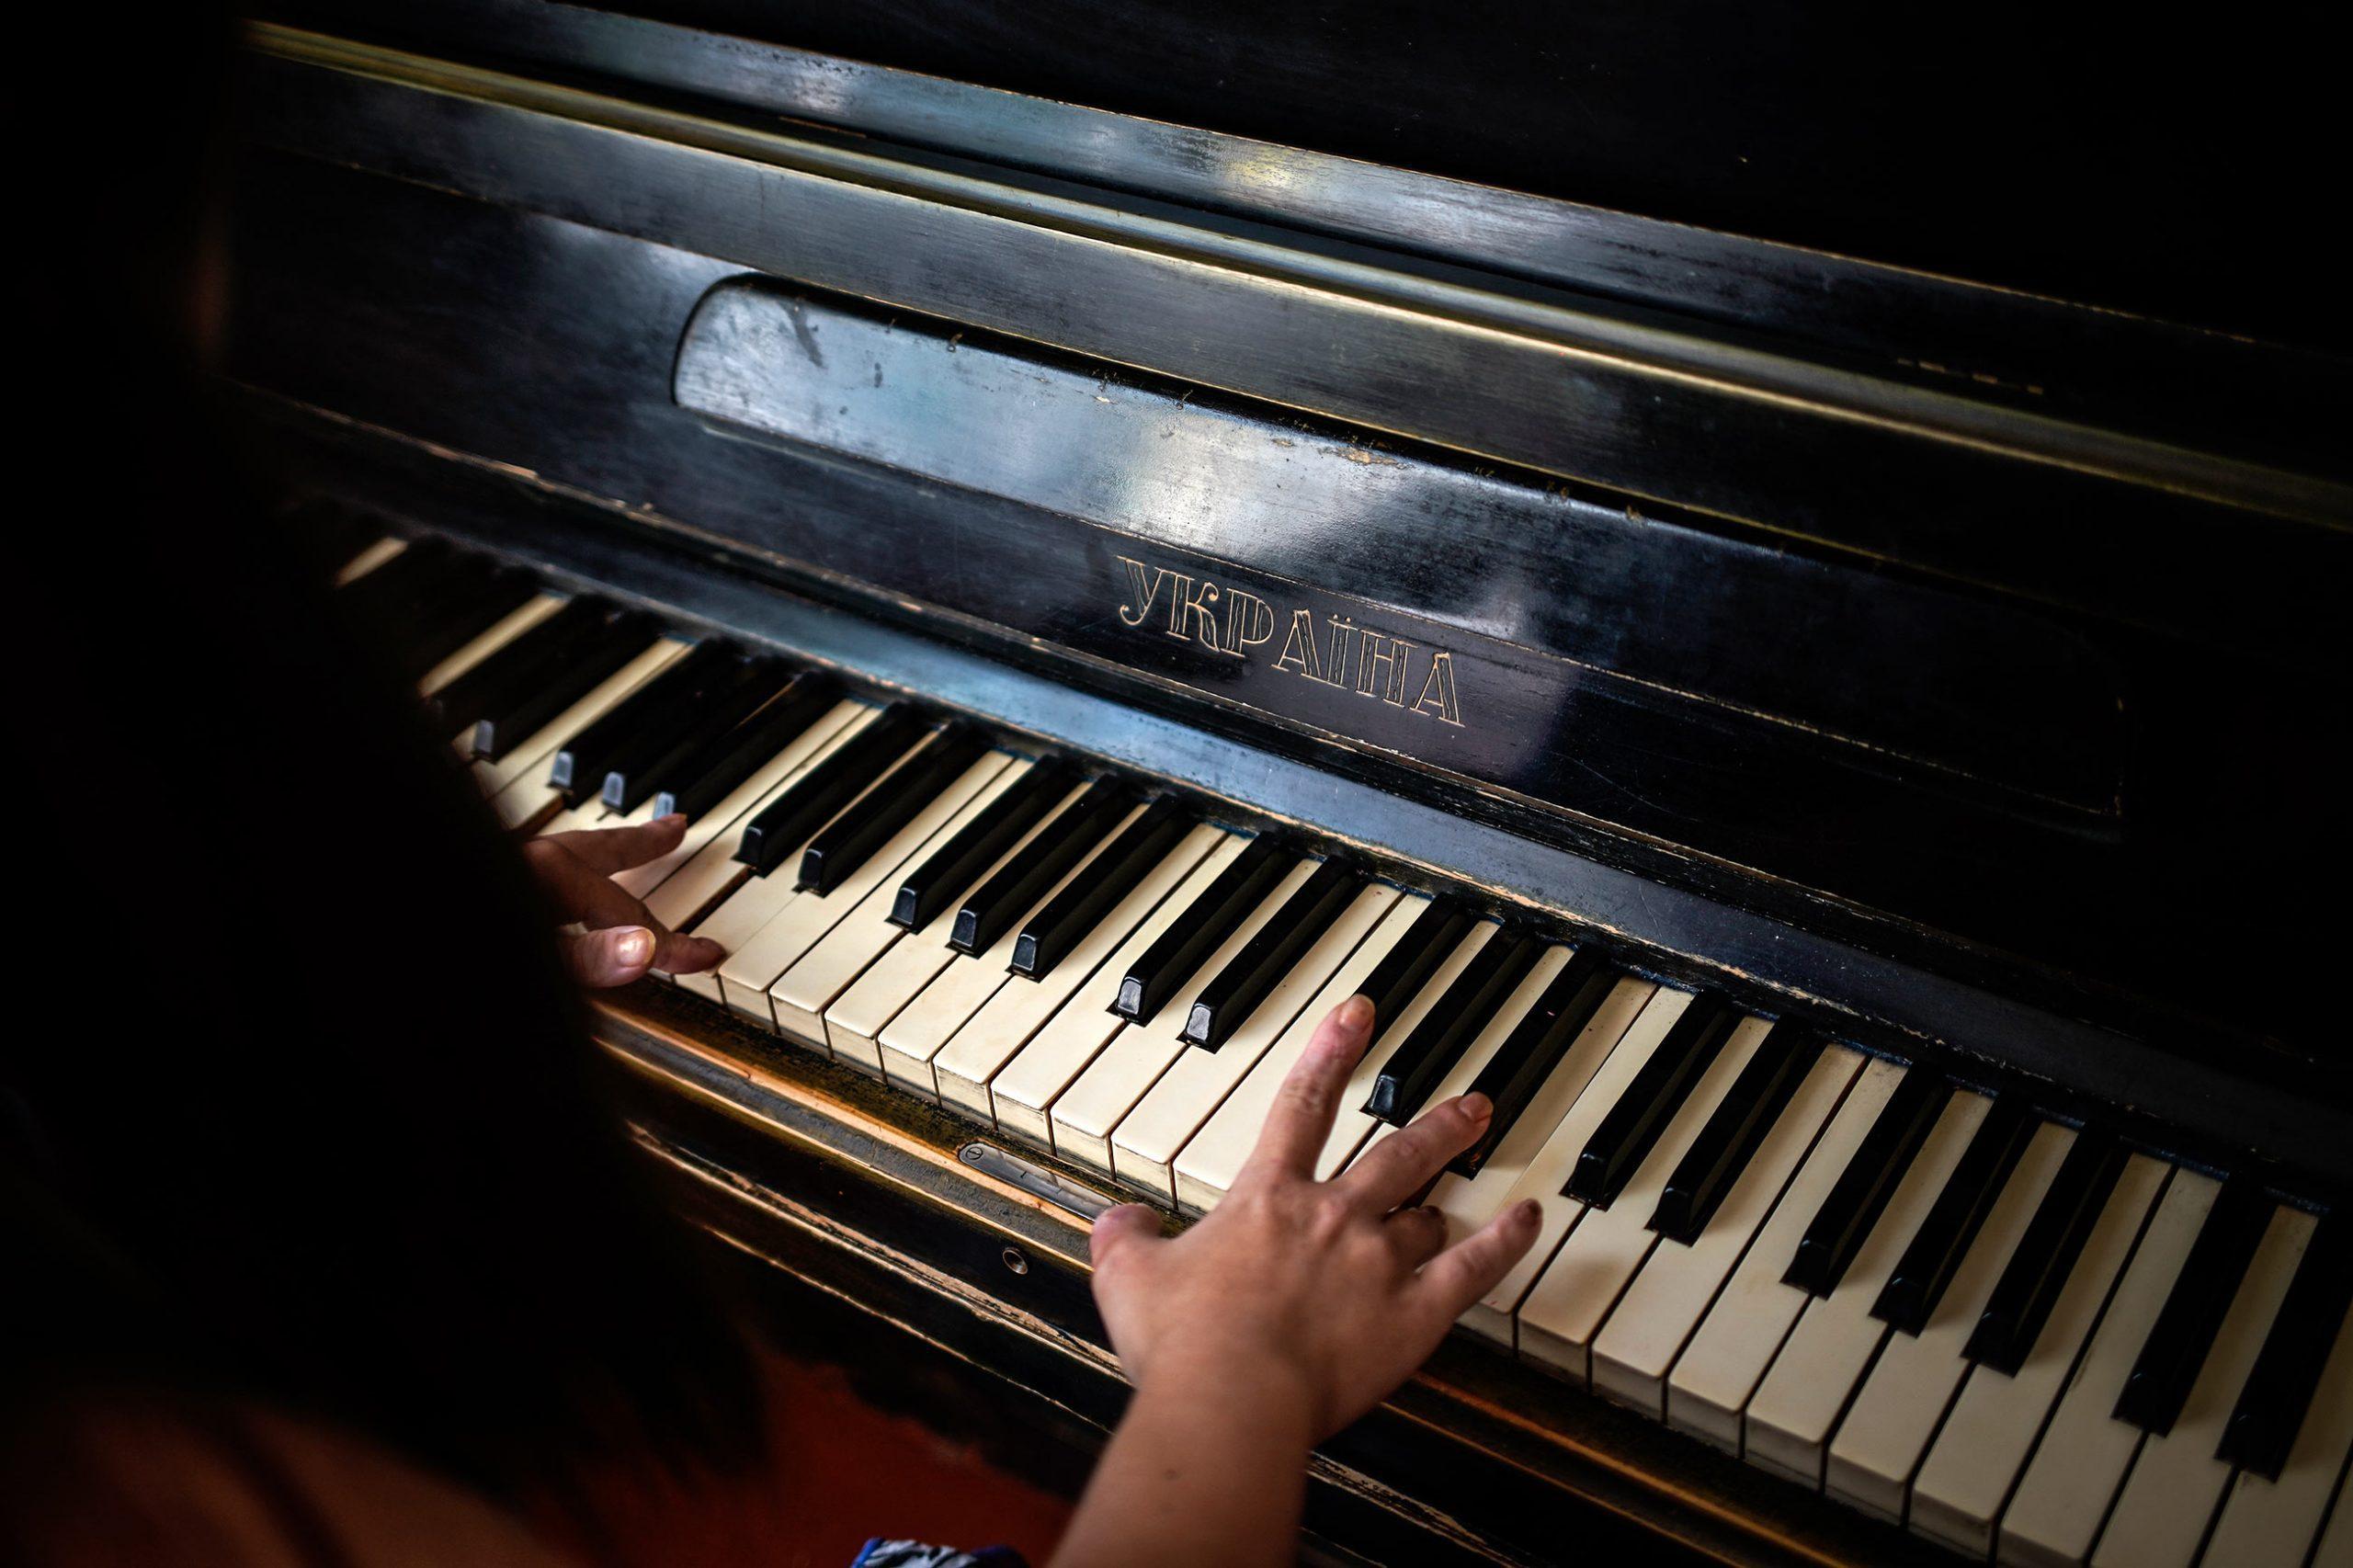 tch7214 scaled - <b>Музыка для Лизы.</b> Как пианистка с синдромом Дауна и ее мама борются за право на образование - Заборона